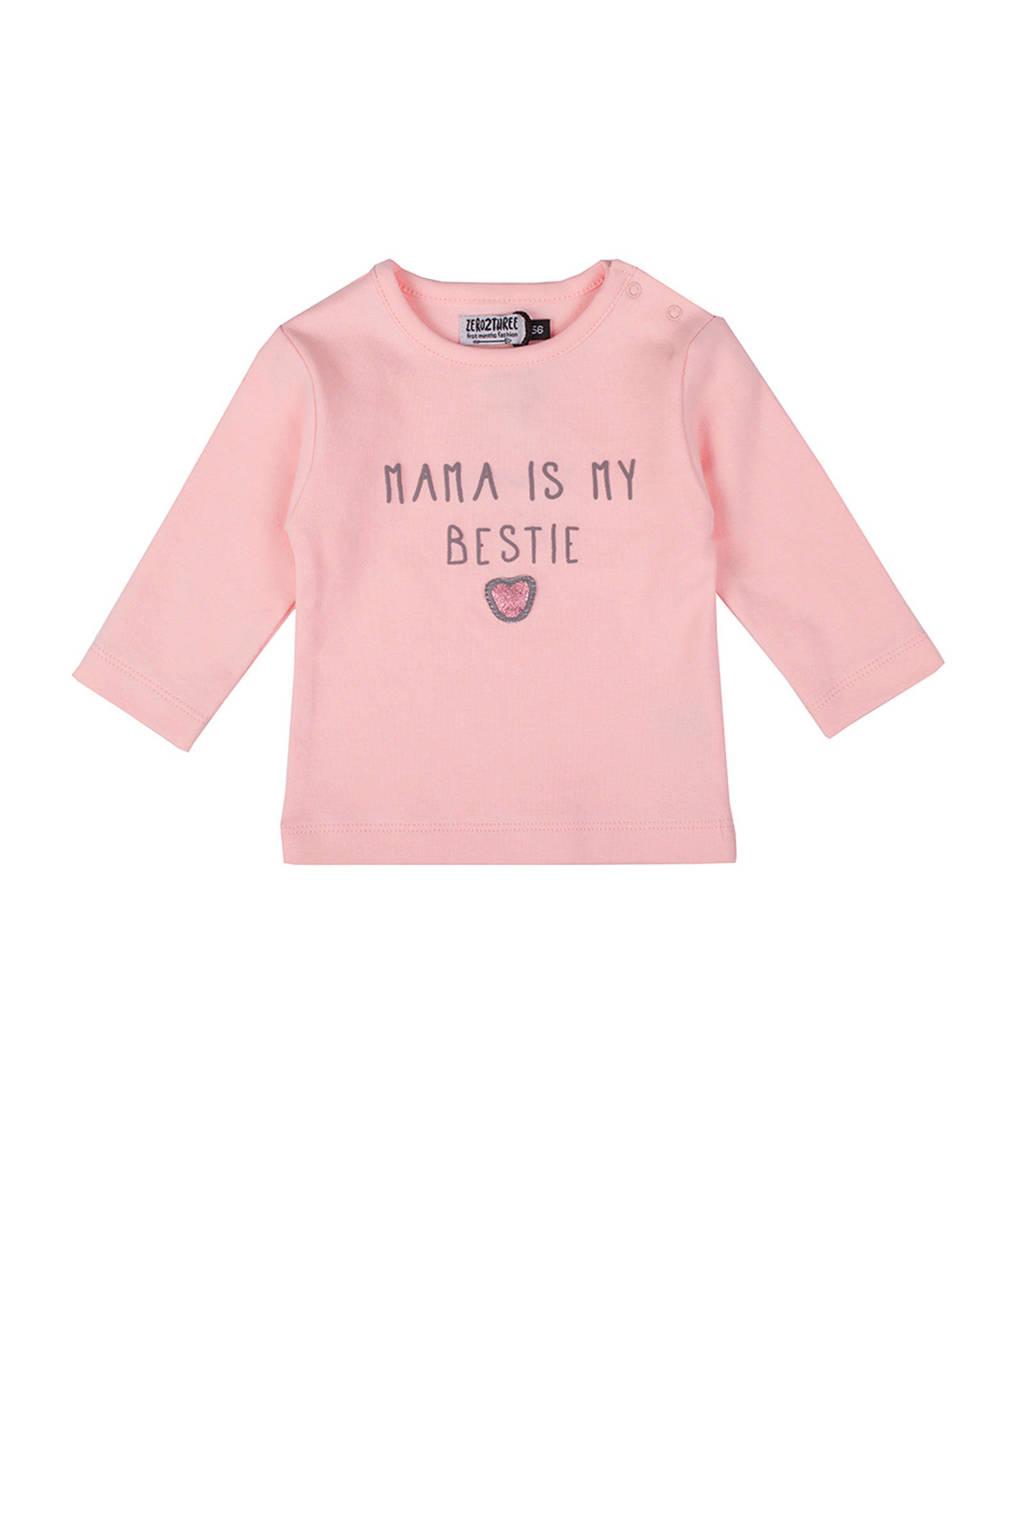 Zero2three baby longsleeve Bestie met tekst roze, Lichtroze